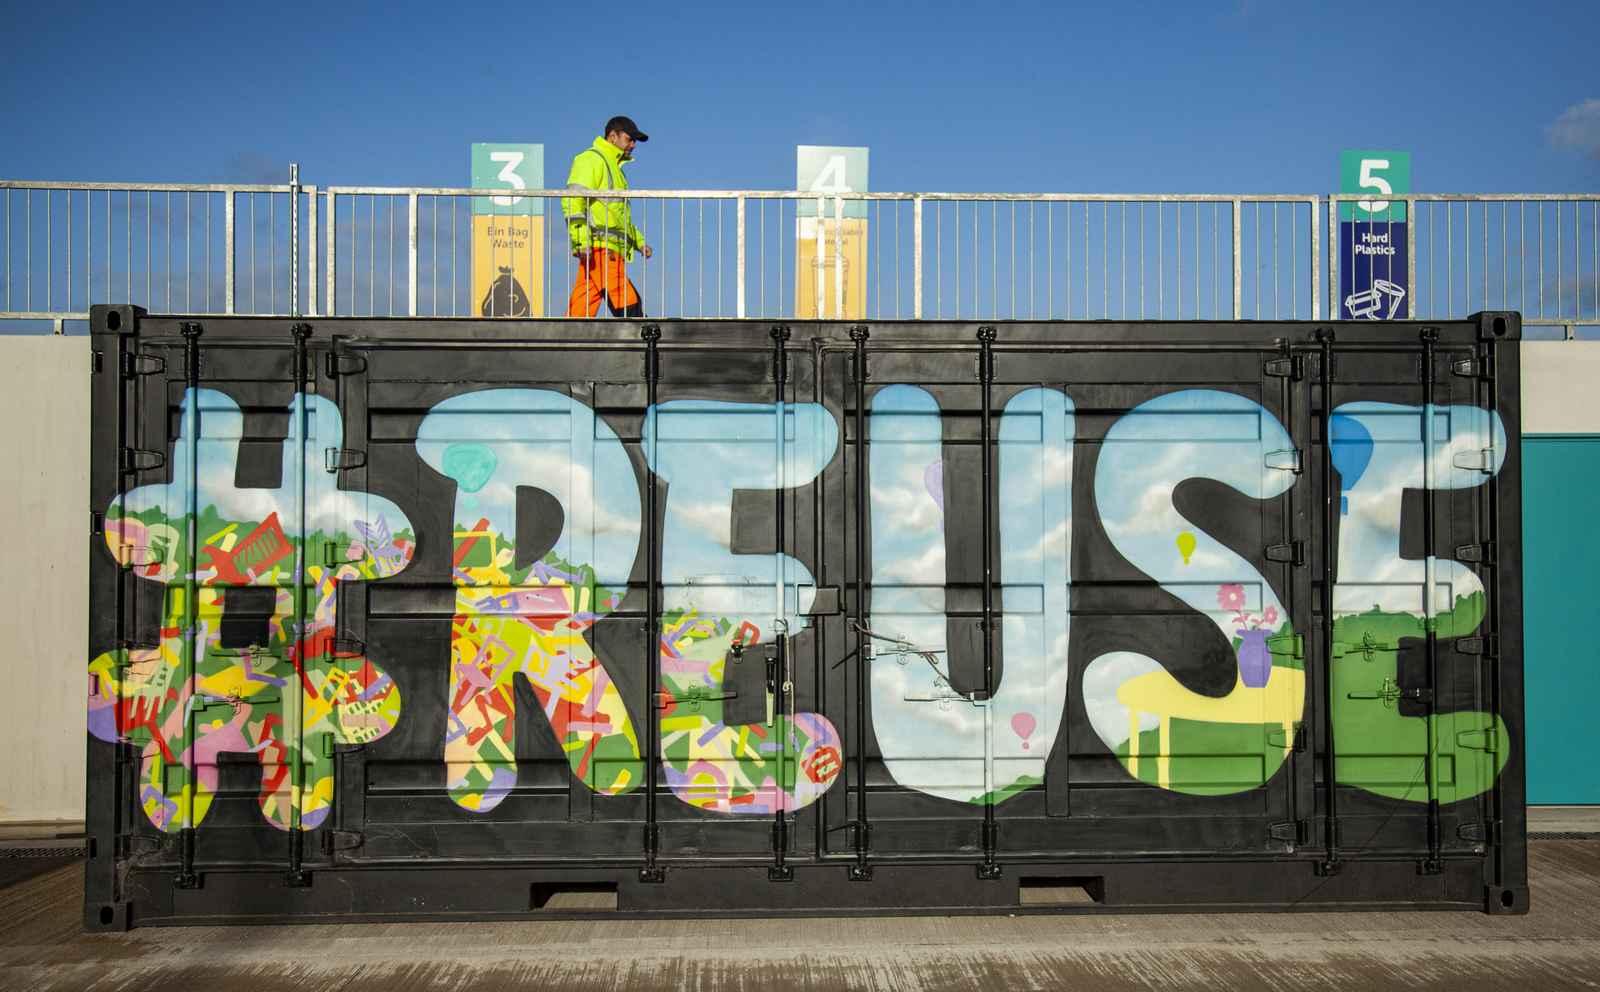 Image Copyright: Bristol Waste Company